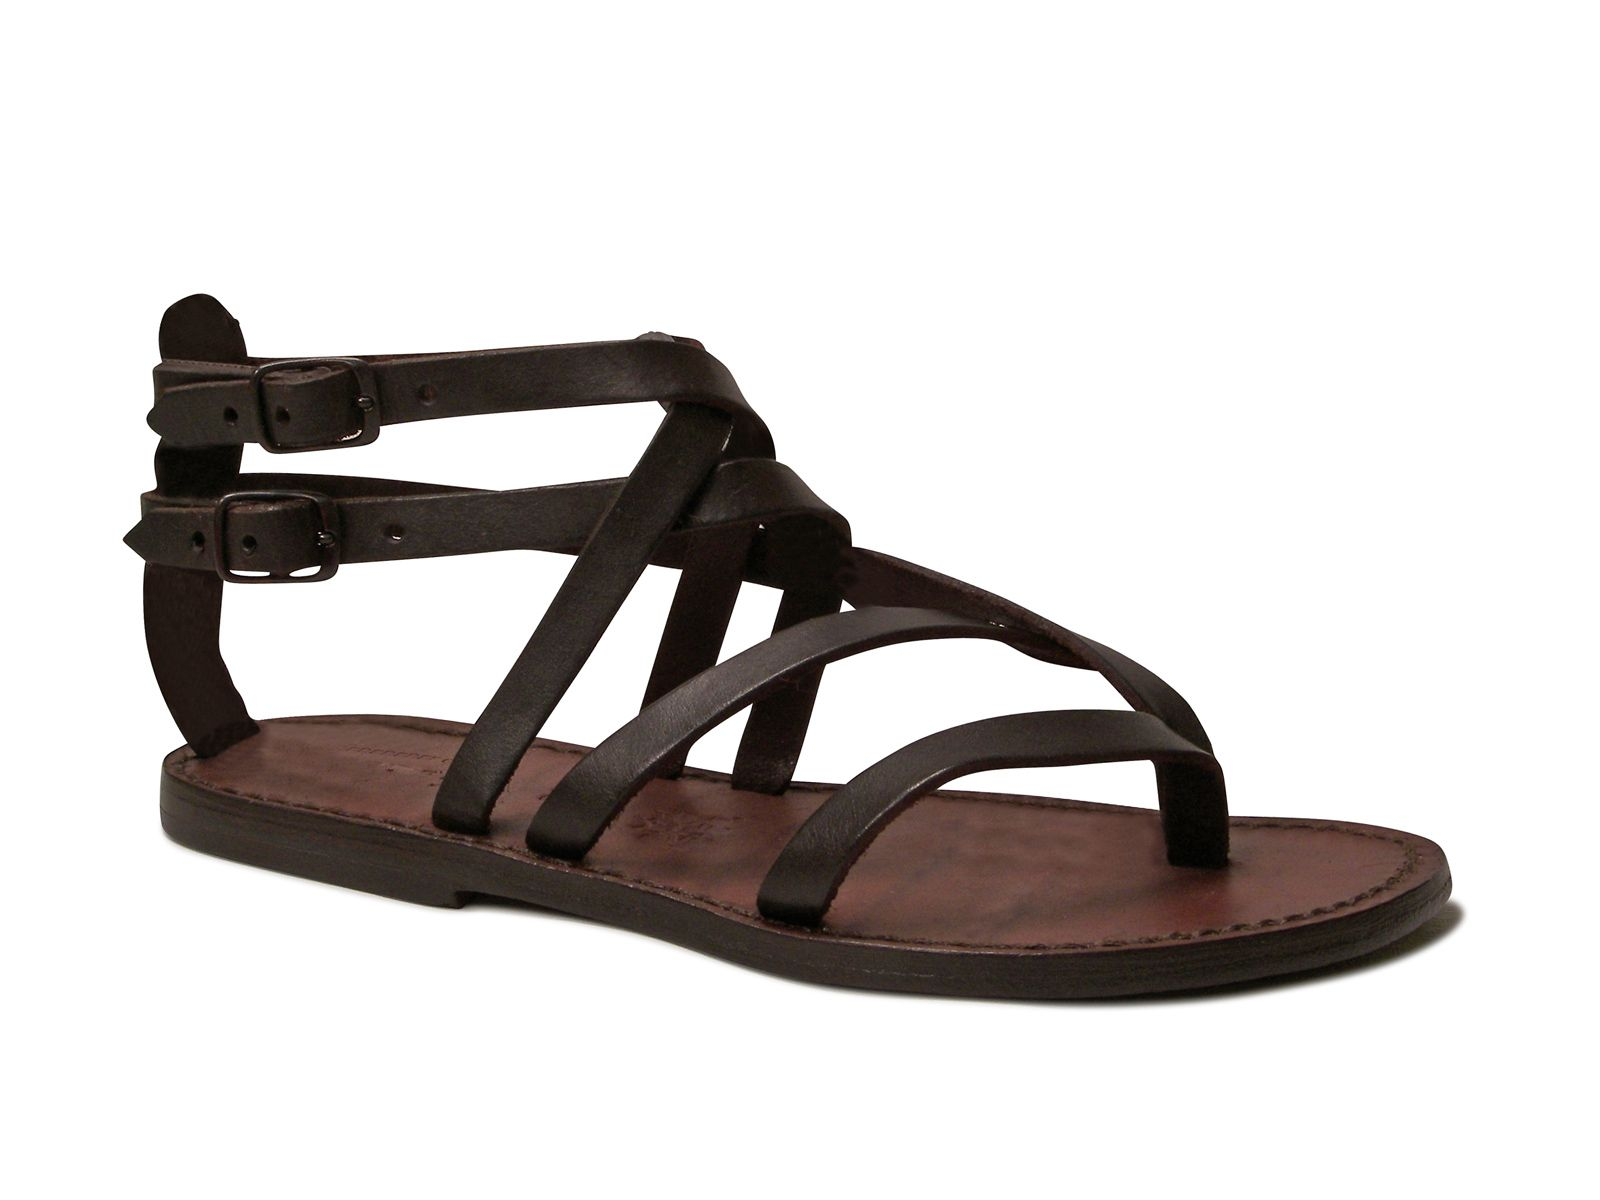 96f4a97092b7ec Handmade womens flat sandals in dark brown leather - Italian Boutique €64